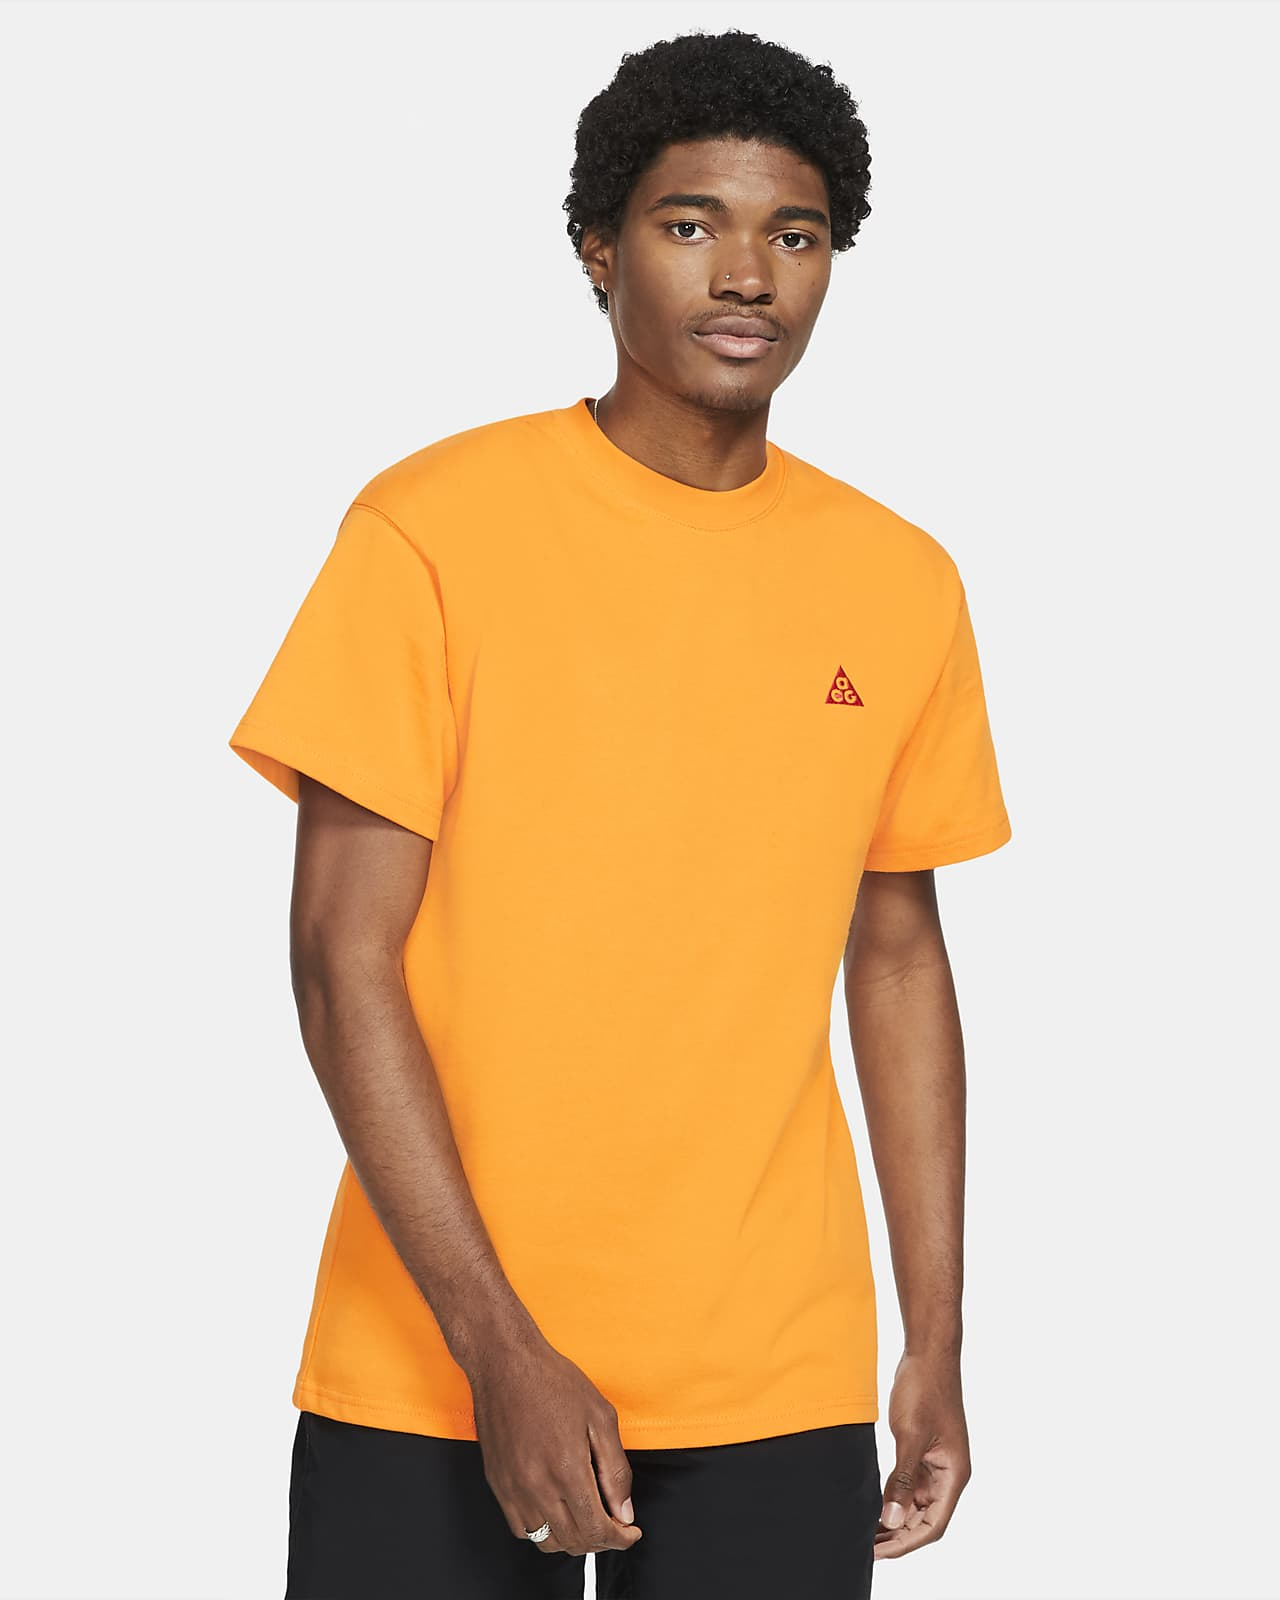 Nike ACG Men's Short-Sleeve T-Shirt